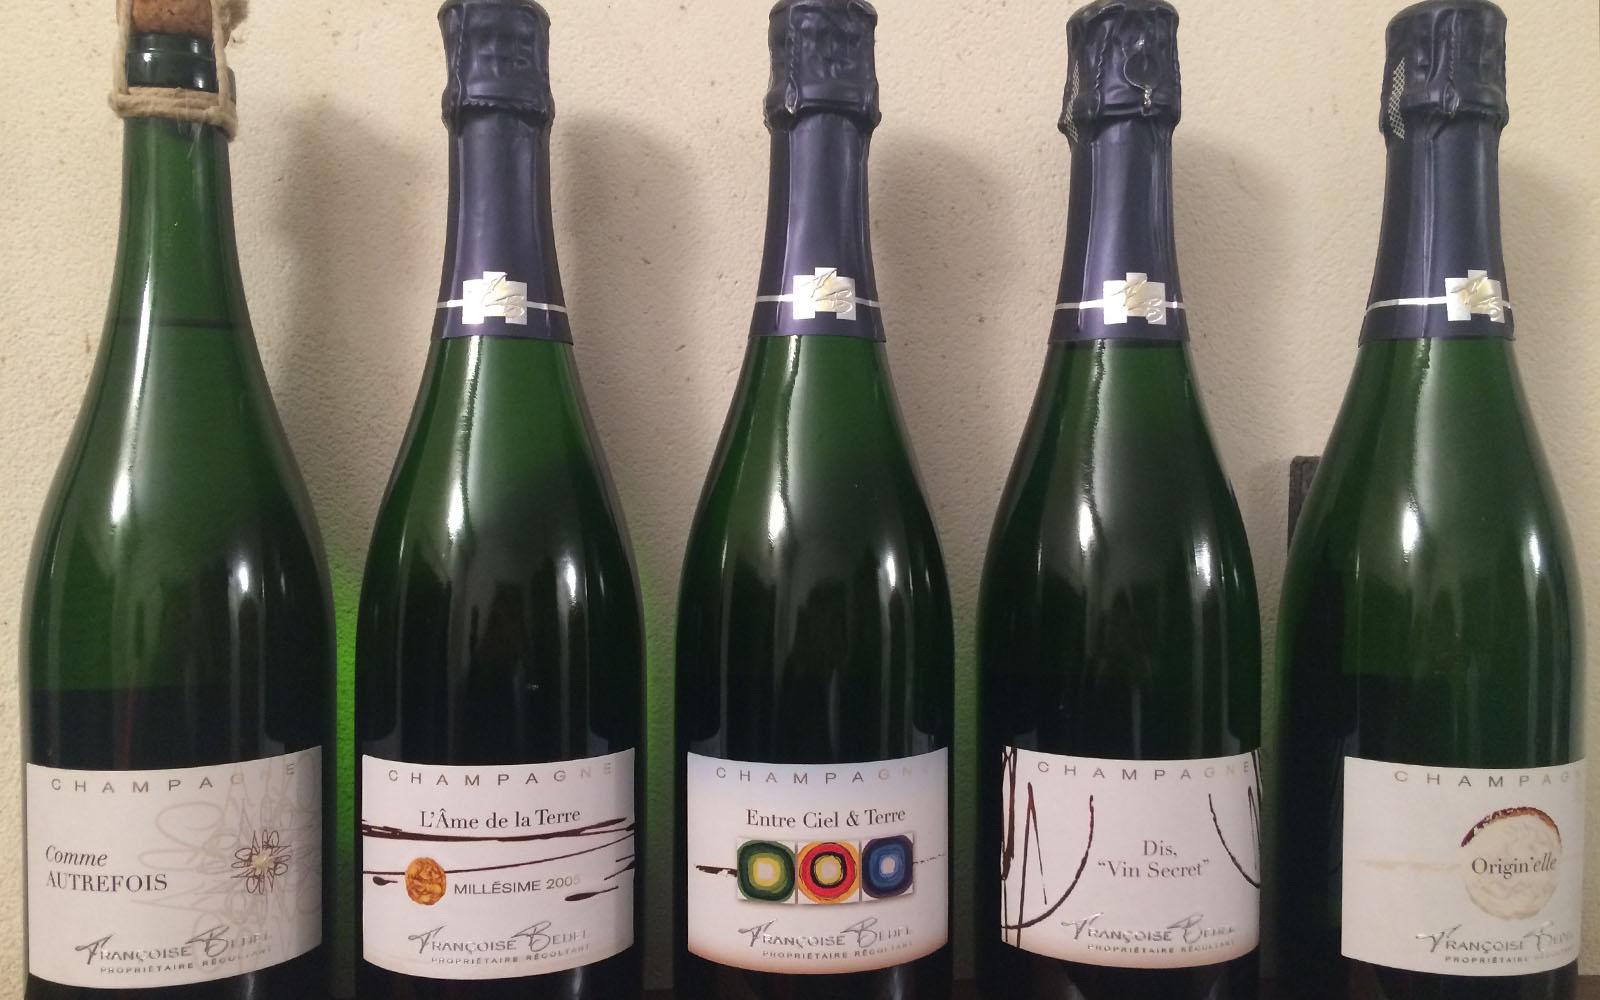 Gli Champagne degustati da Françoise Bedel.